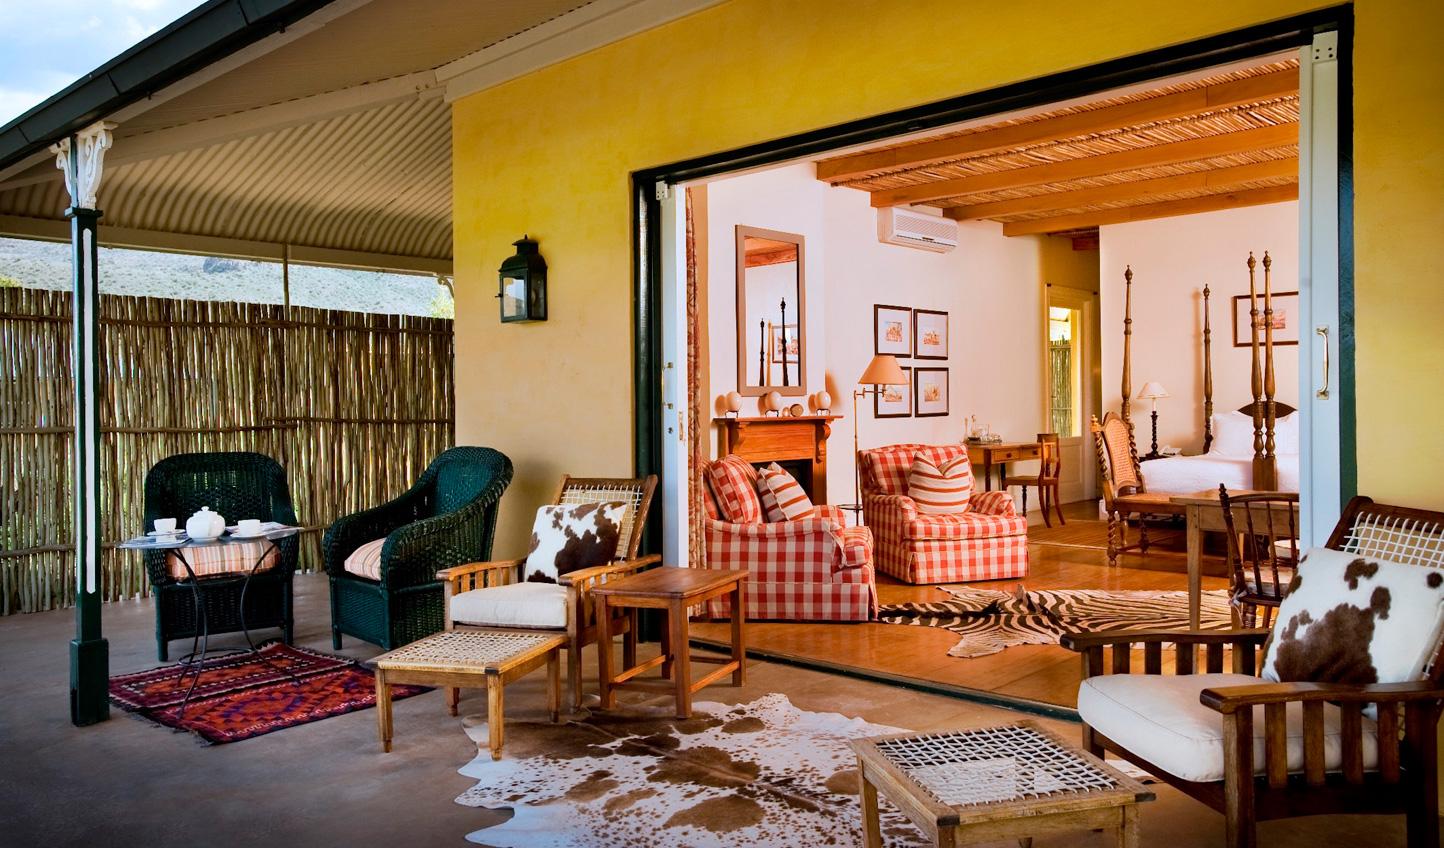 Eclectic furniture at Karoo Lodge